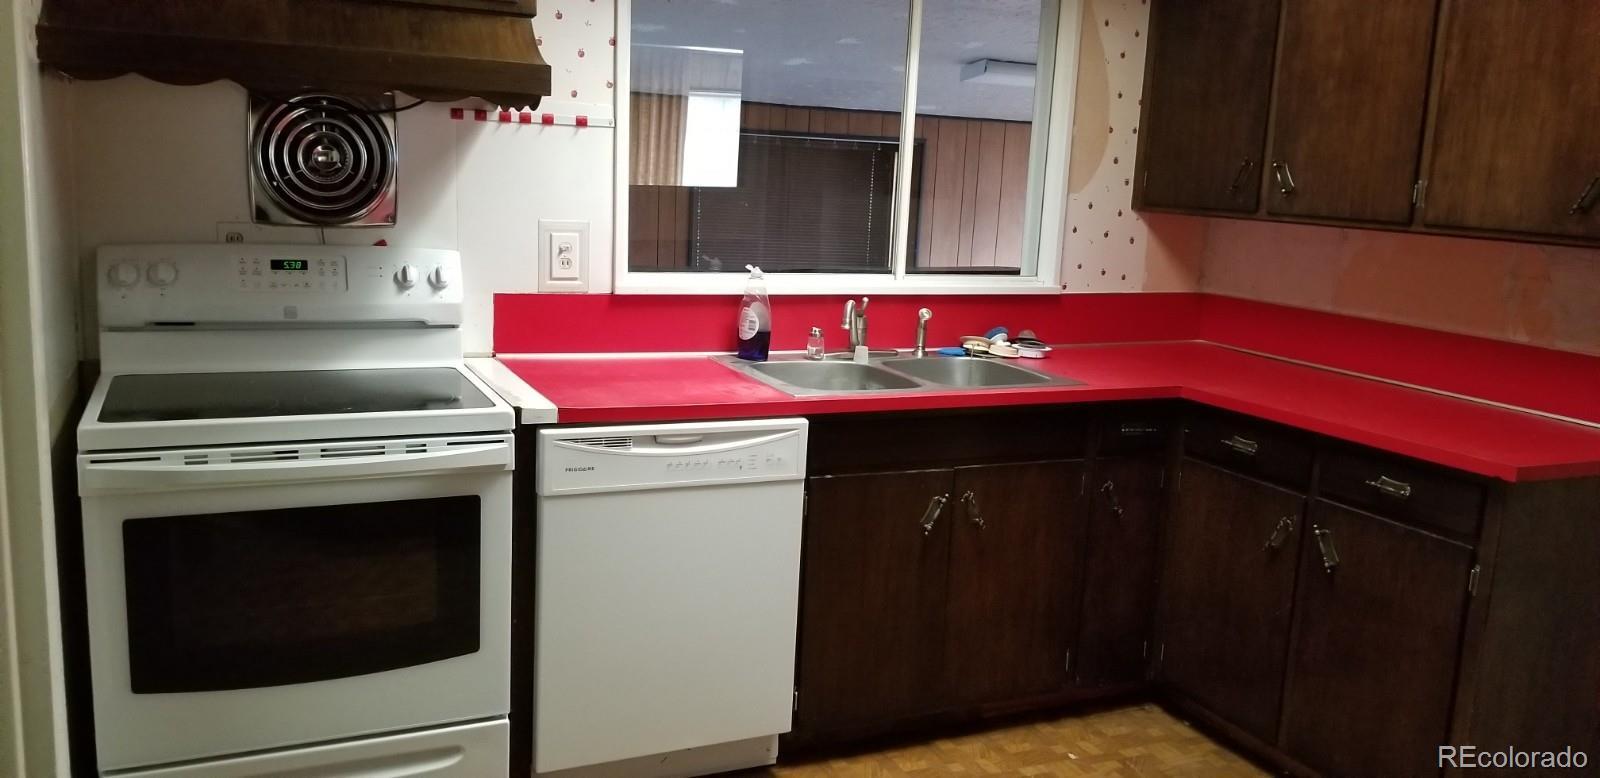 MLS# 3282740 - 7 - 221 Everett Drive, Colorado Springs, CO 80911